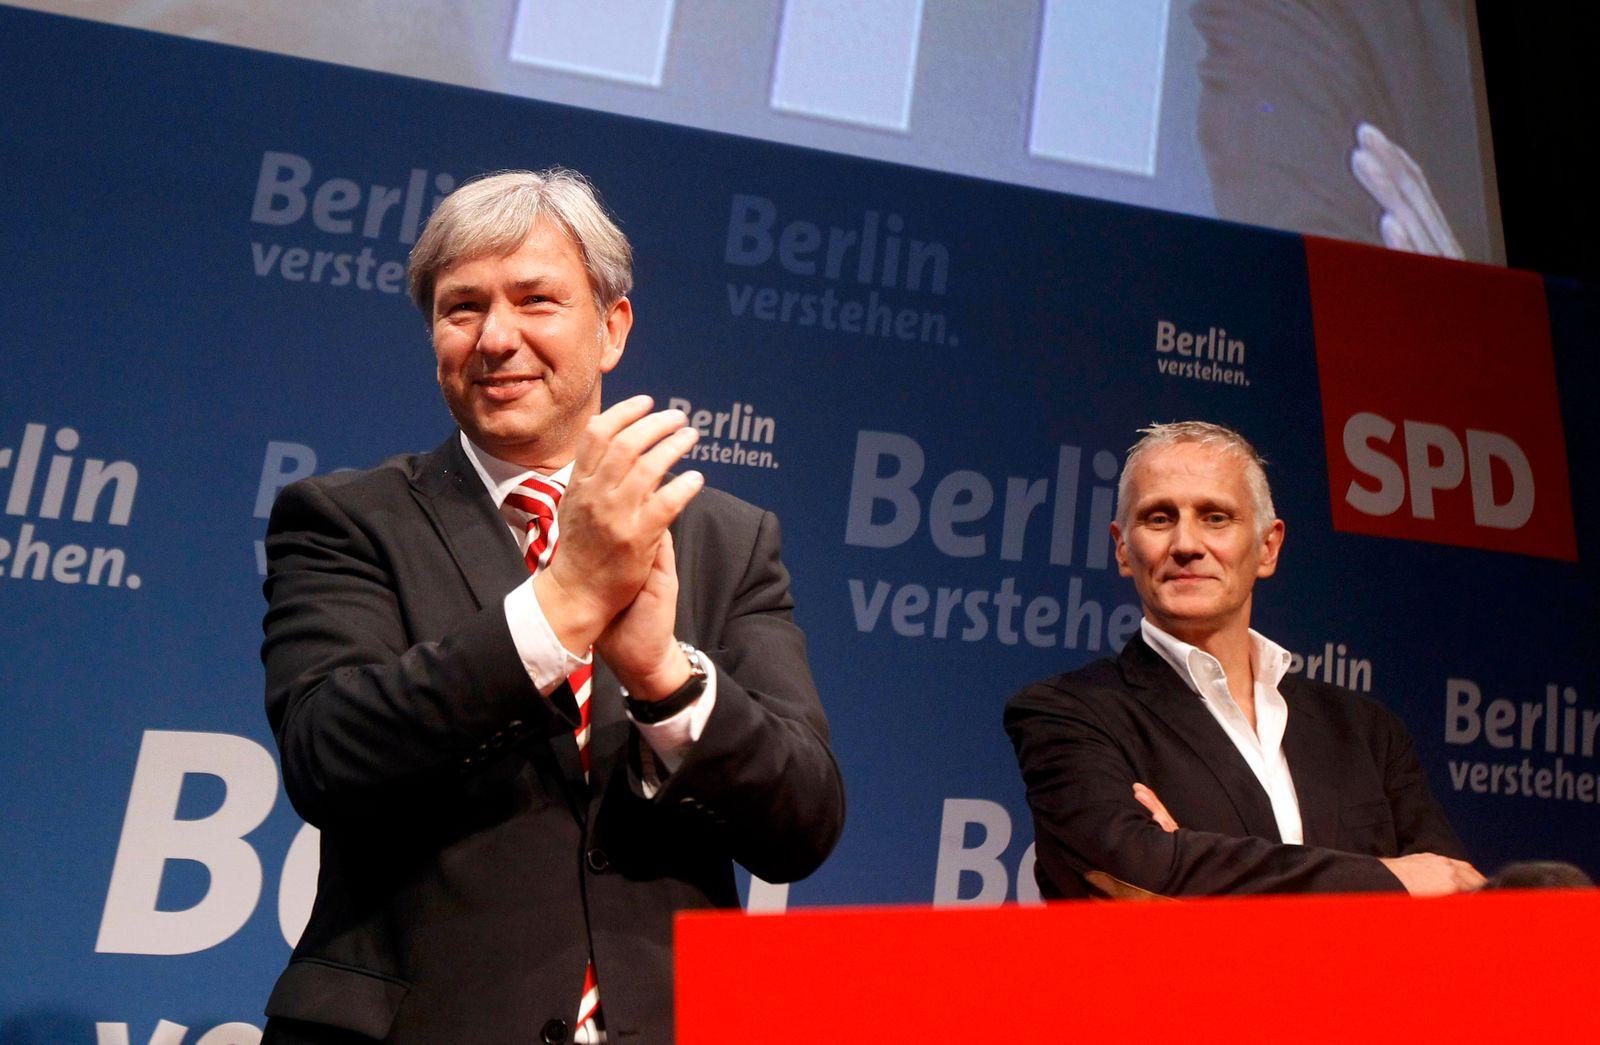 Berlin/ Wahlen/Klaus Wowereit